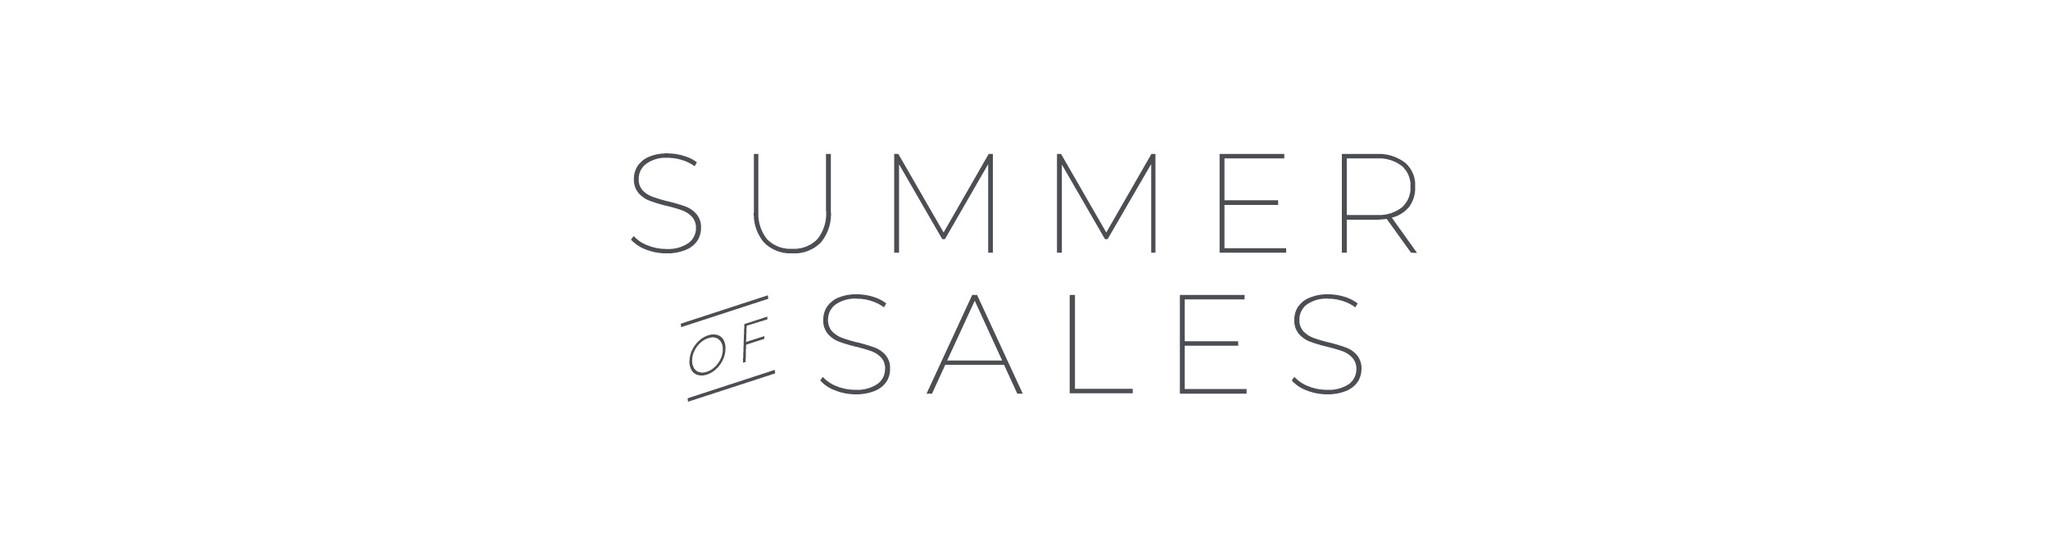 Summer of Sales